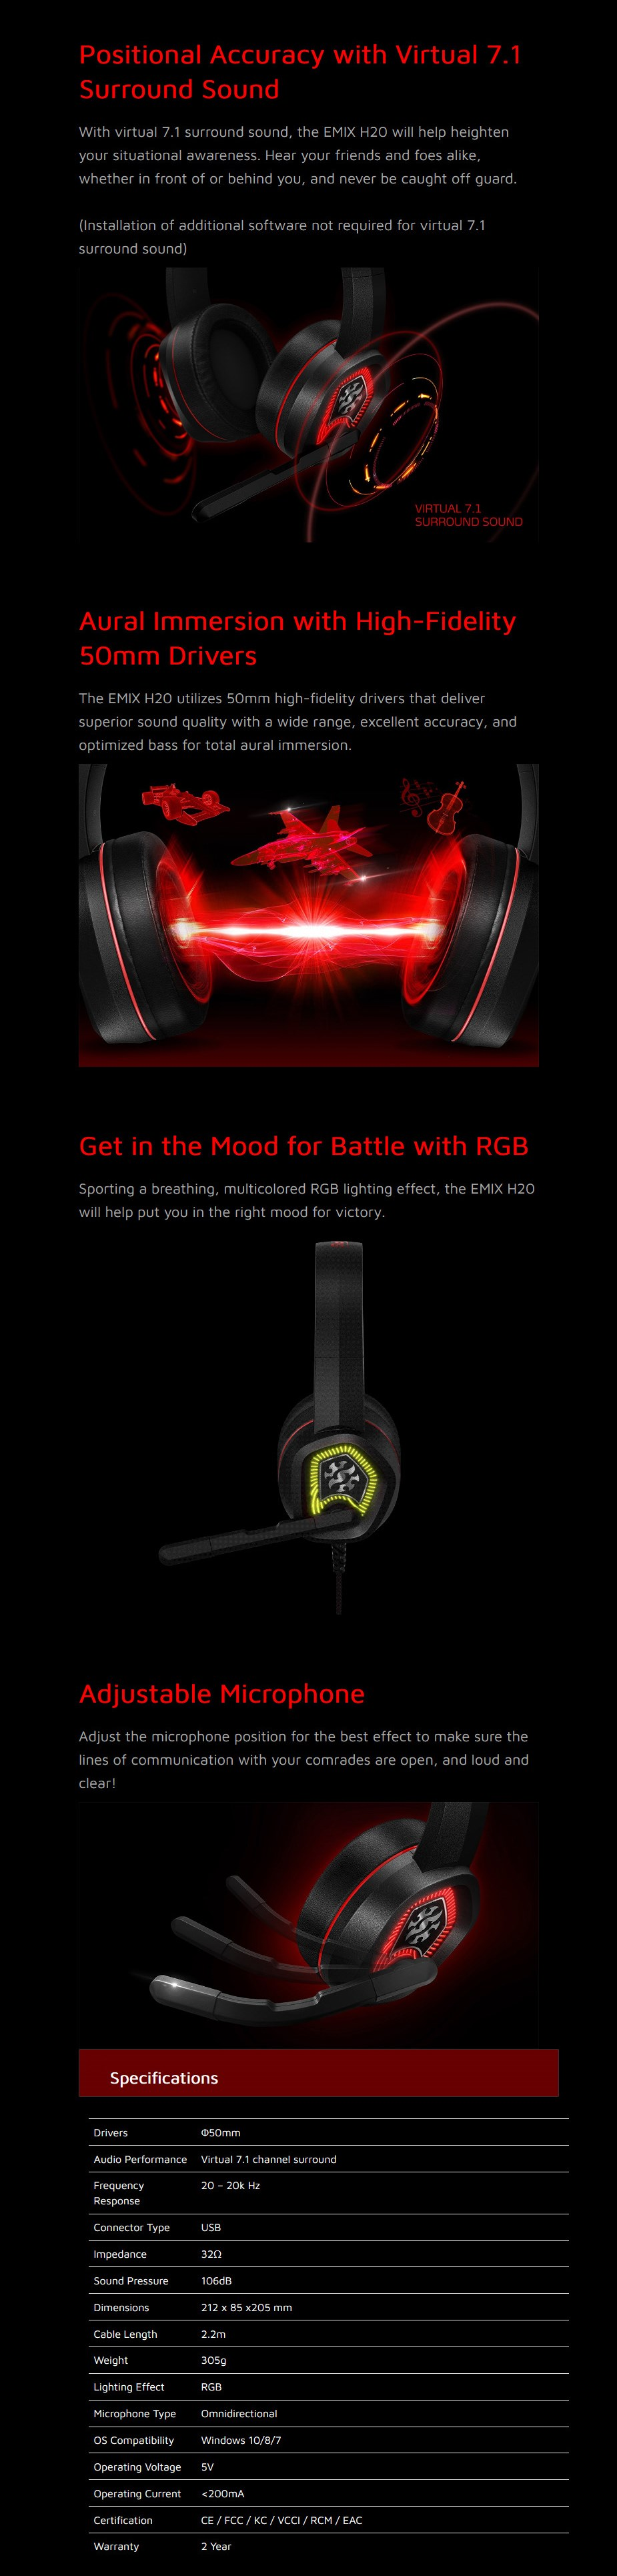 ADATA EMIX H20 Virtual 7.1 Surround Sound Gaming Headset - Overview 1